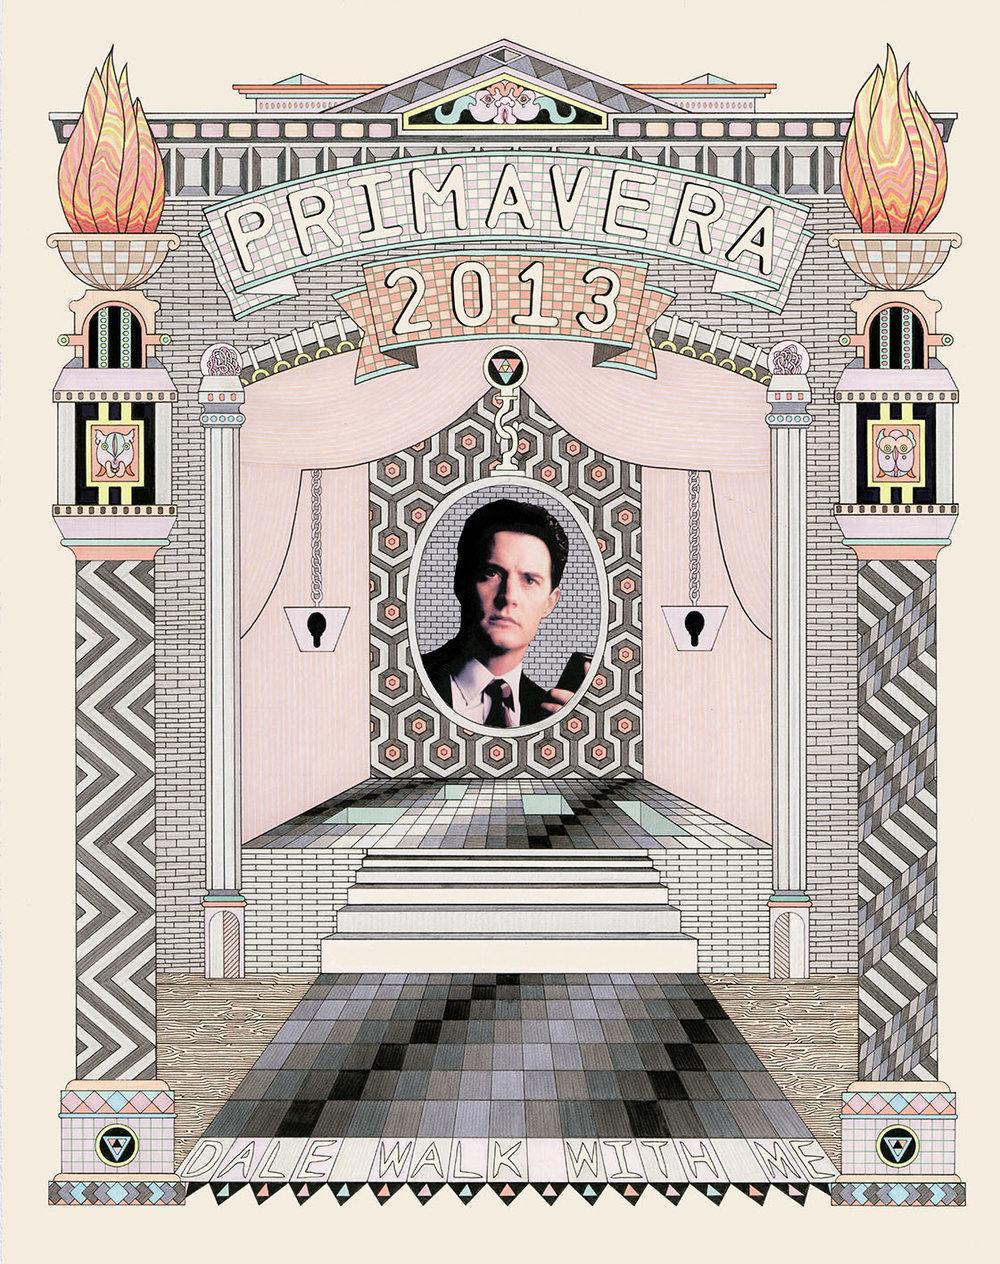 Cover for Primavera exhibition catalogue, 2013 Museum of Contemporary Art, Sydney, Australia